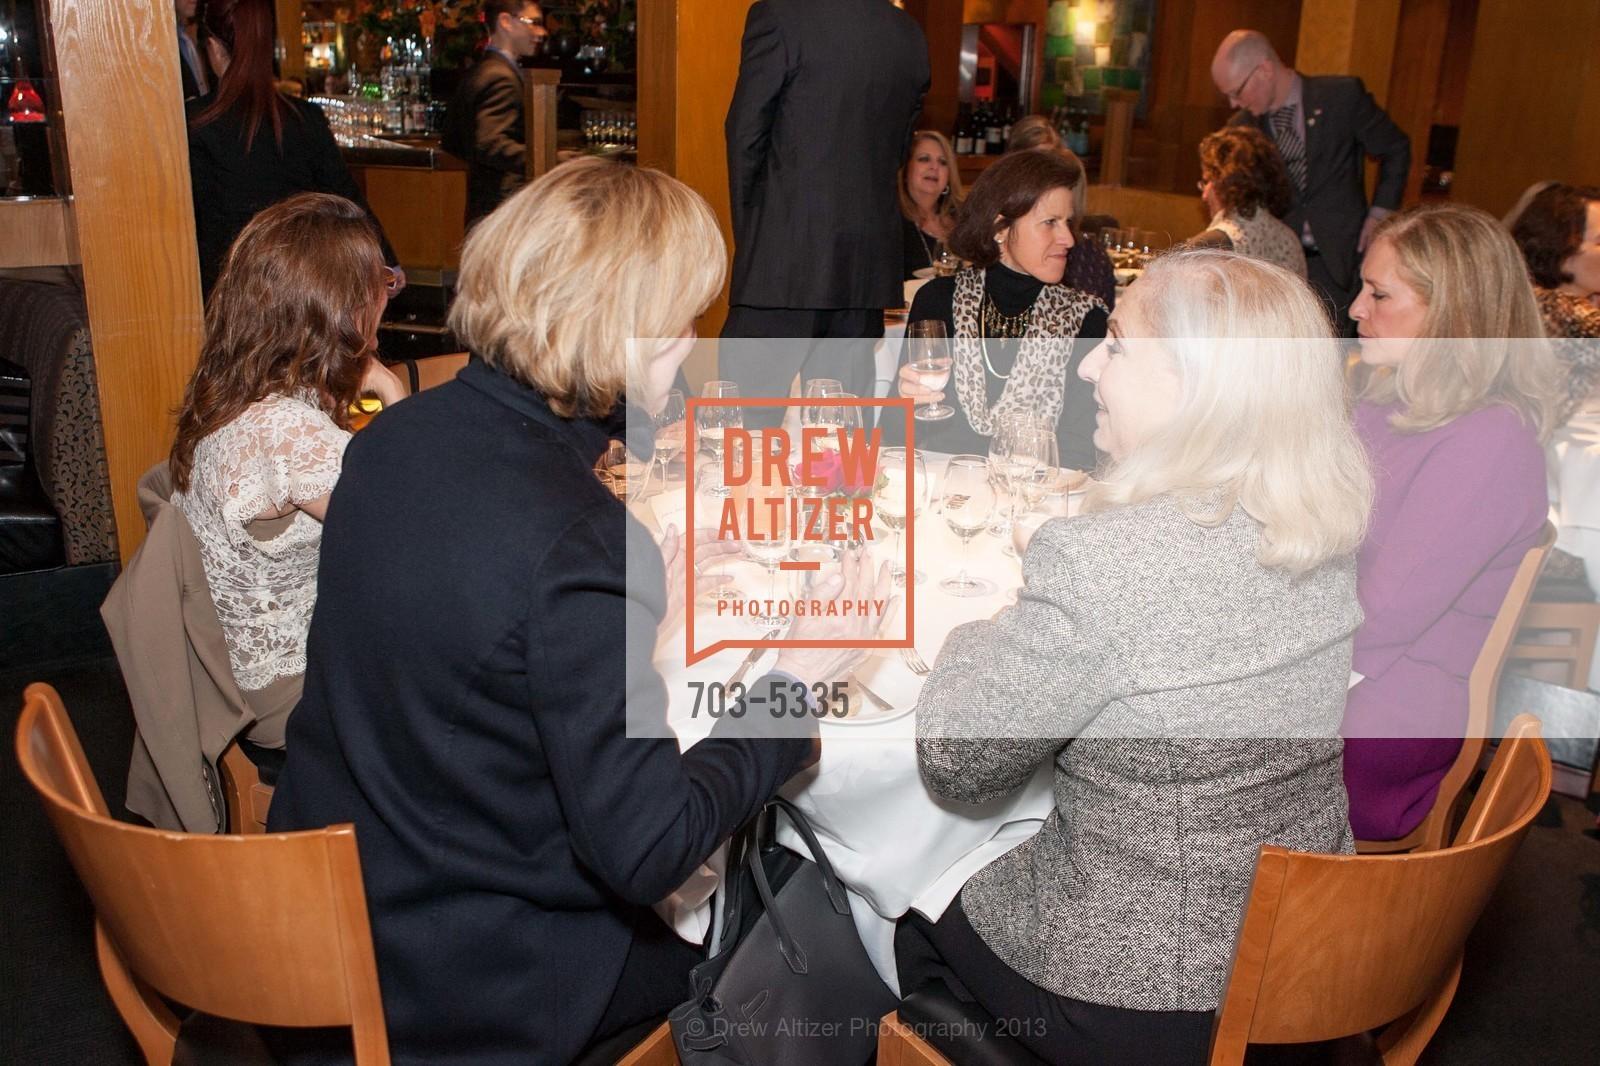 Susan Bates, Leslie Gibin, Nancy Sidow, Photo #703-5335